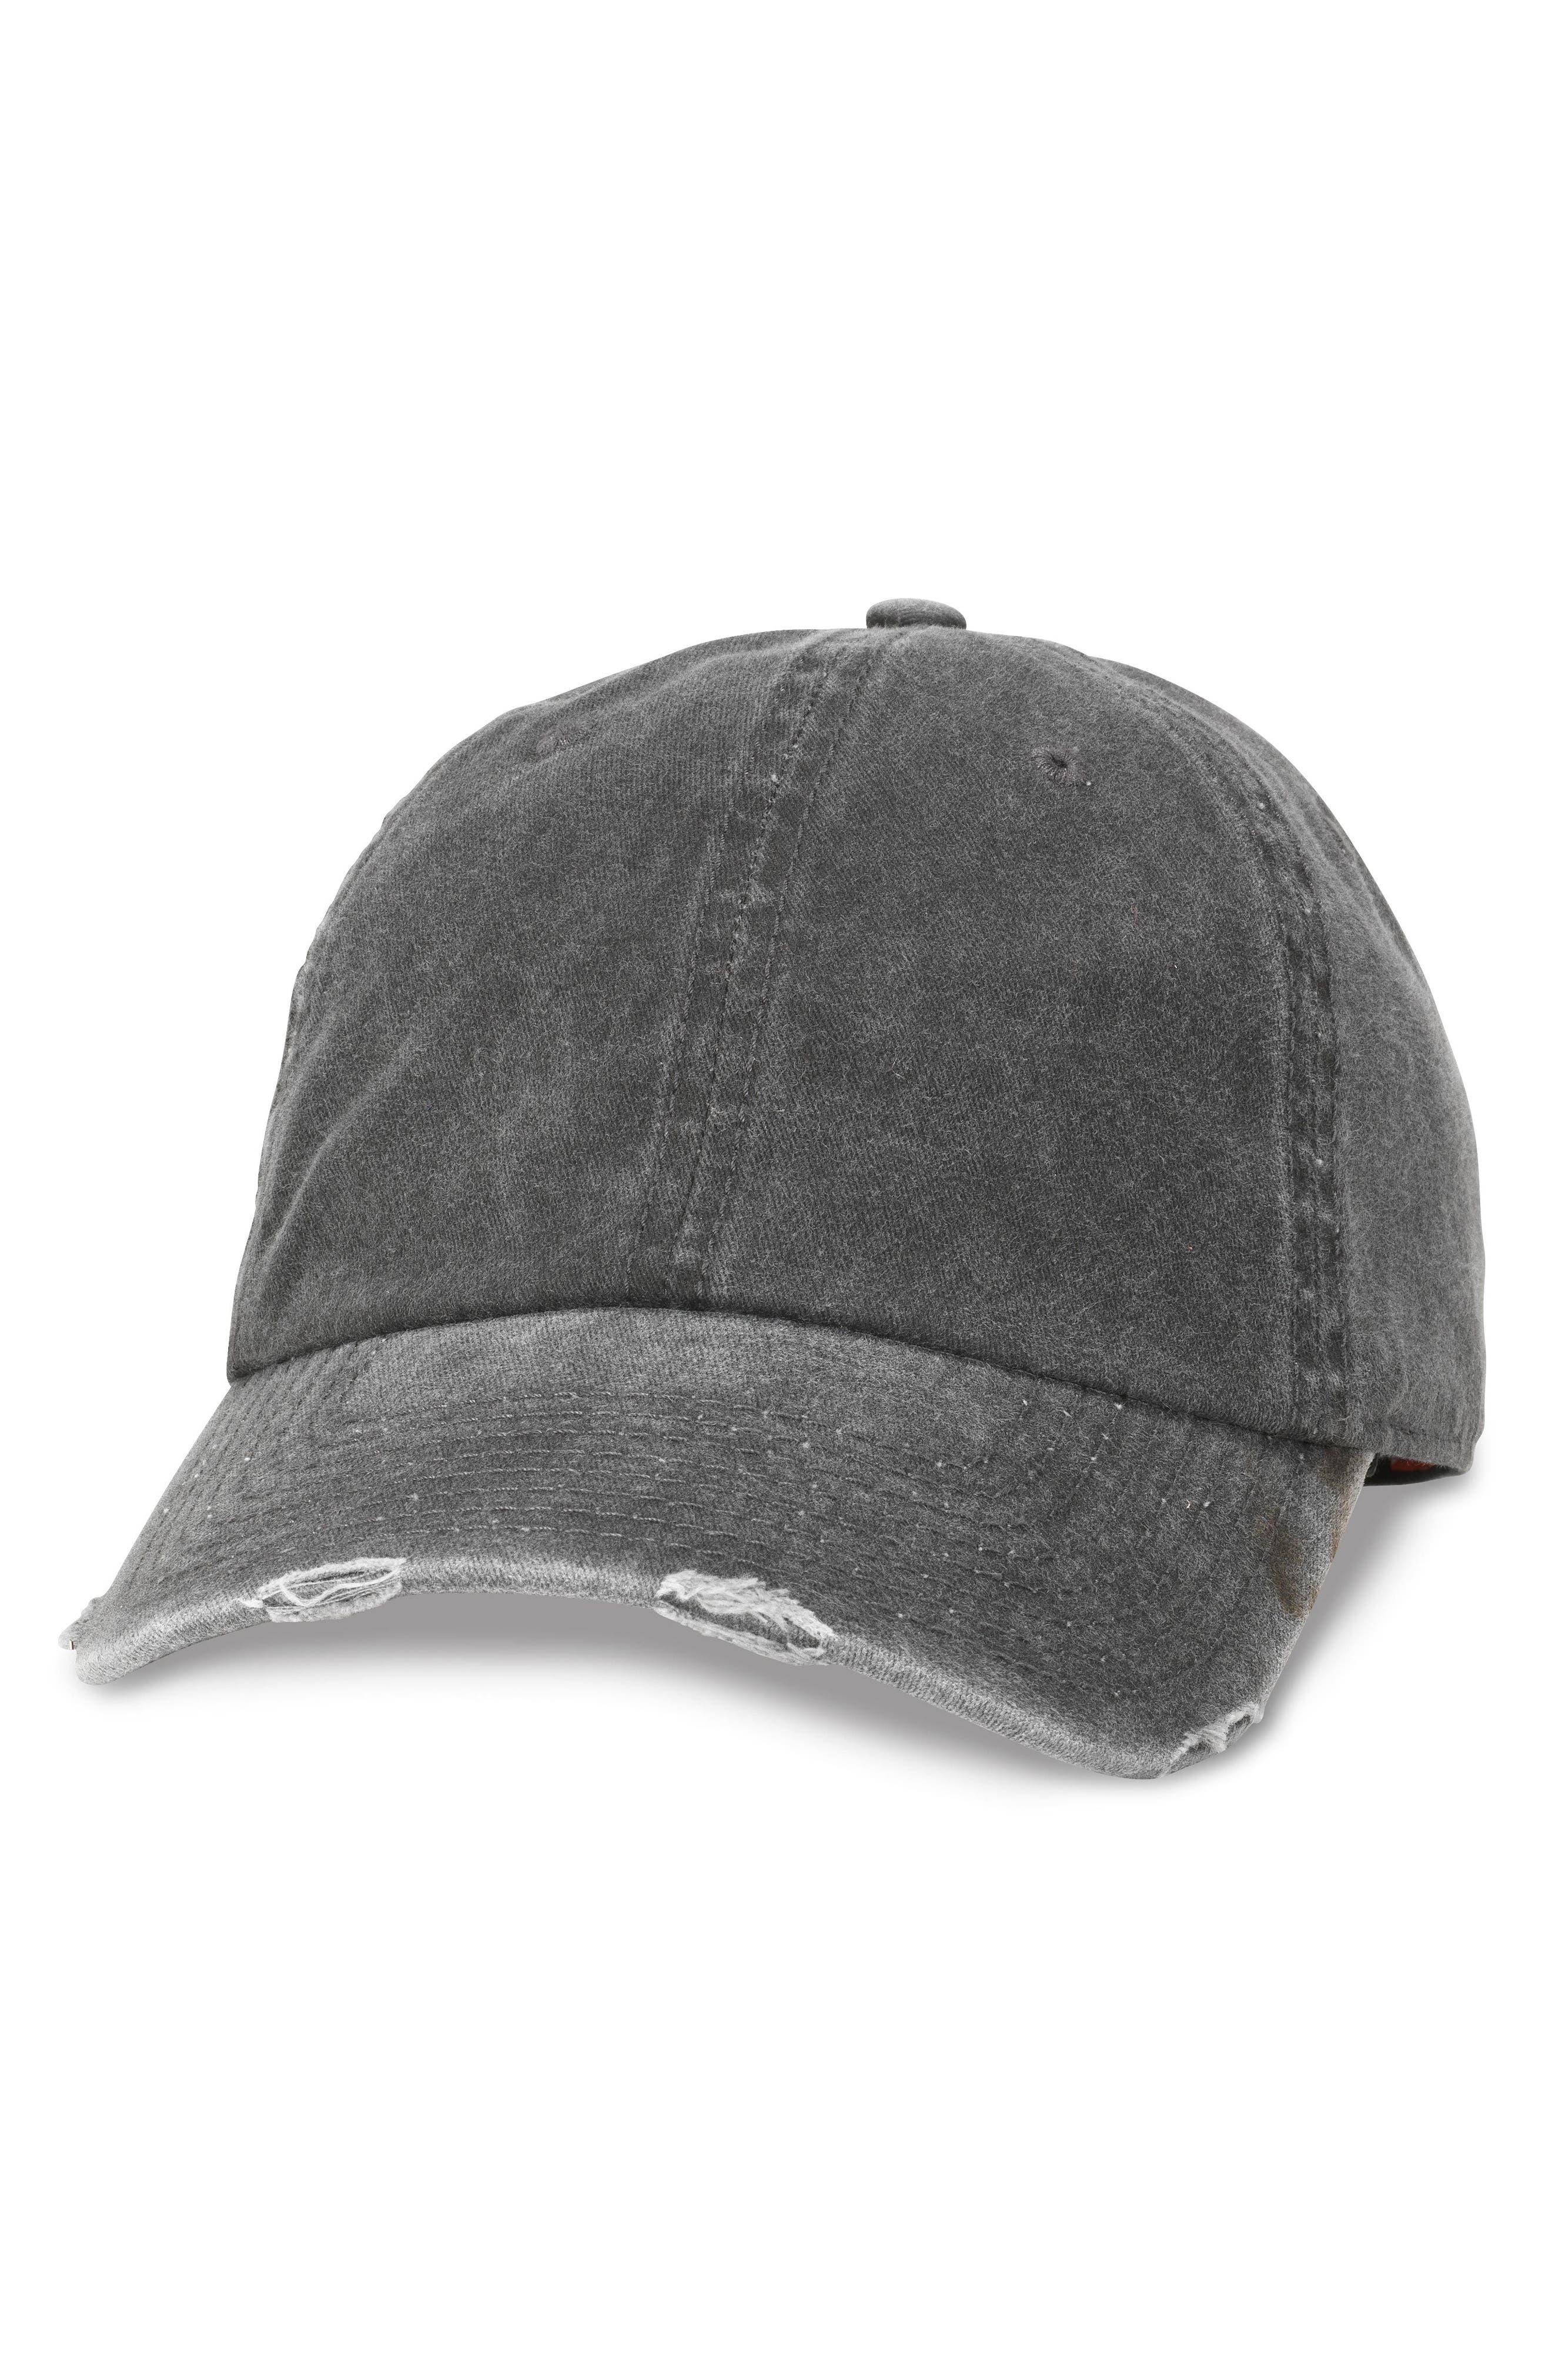 Raglan Legacy Ball Cap,                             Main thumbnail 1, color,                             001